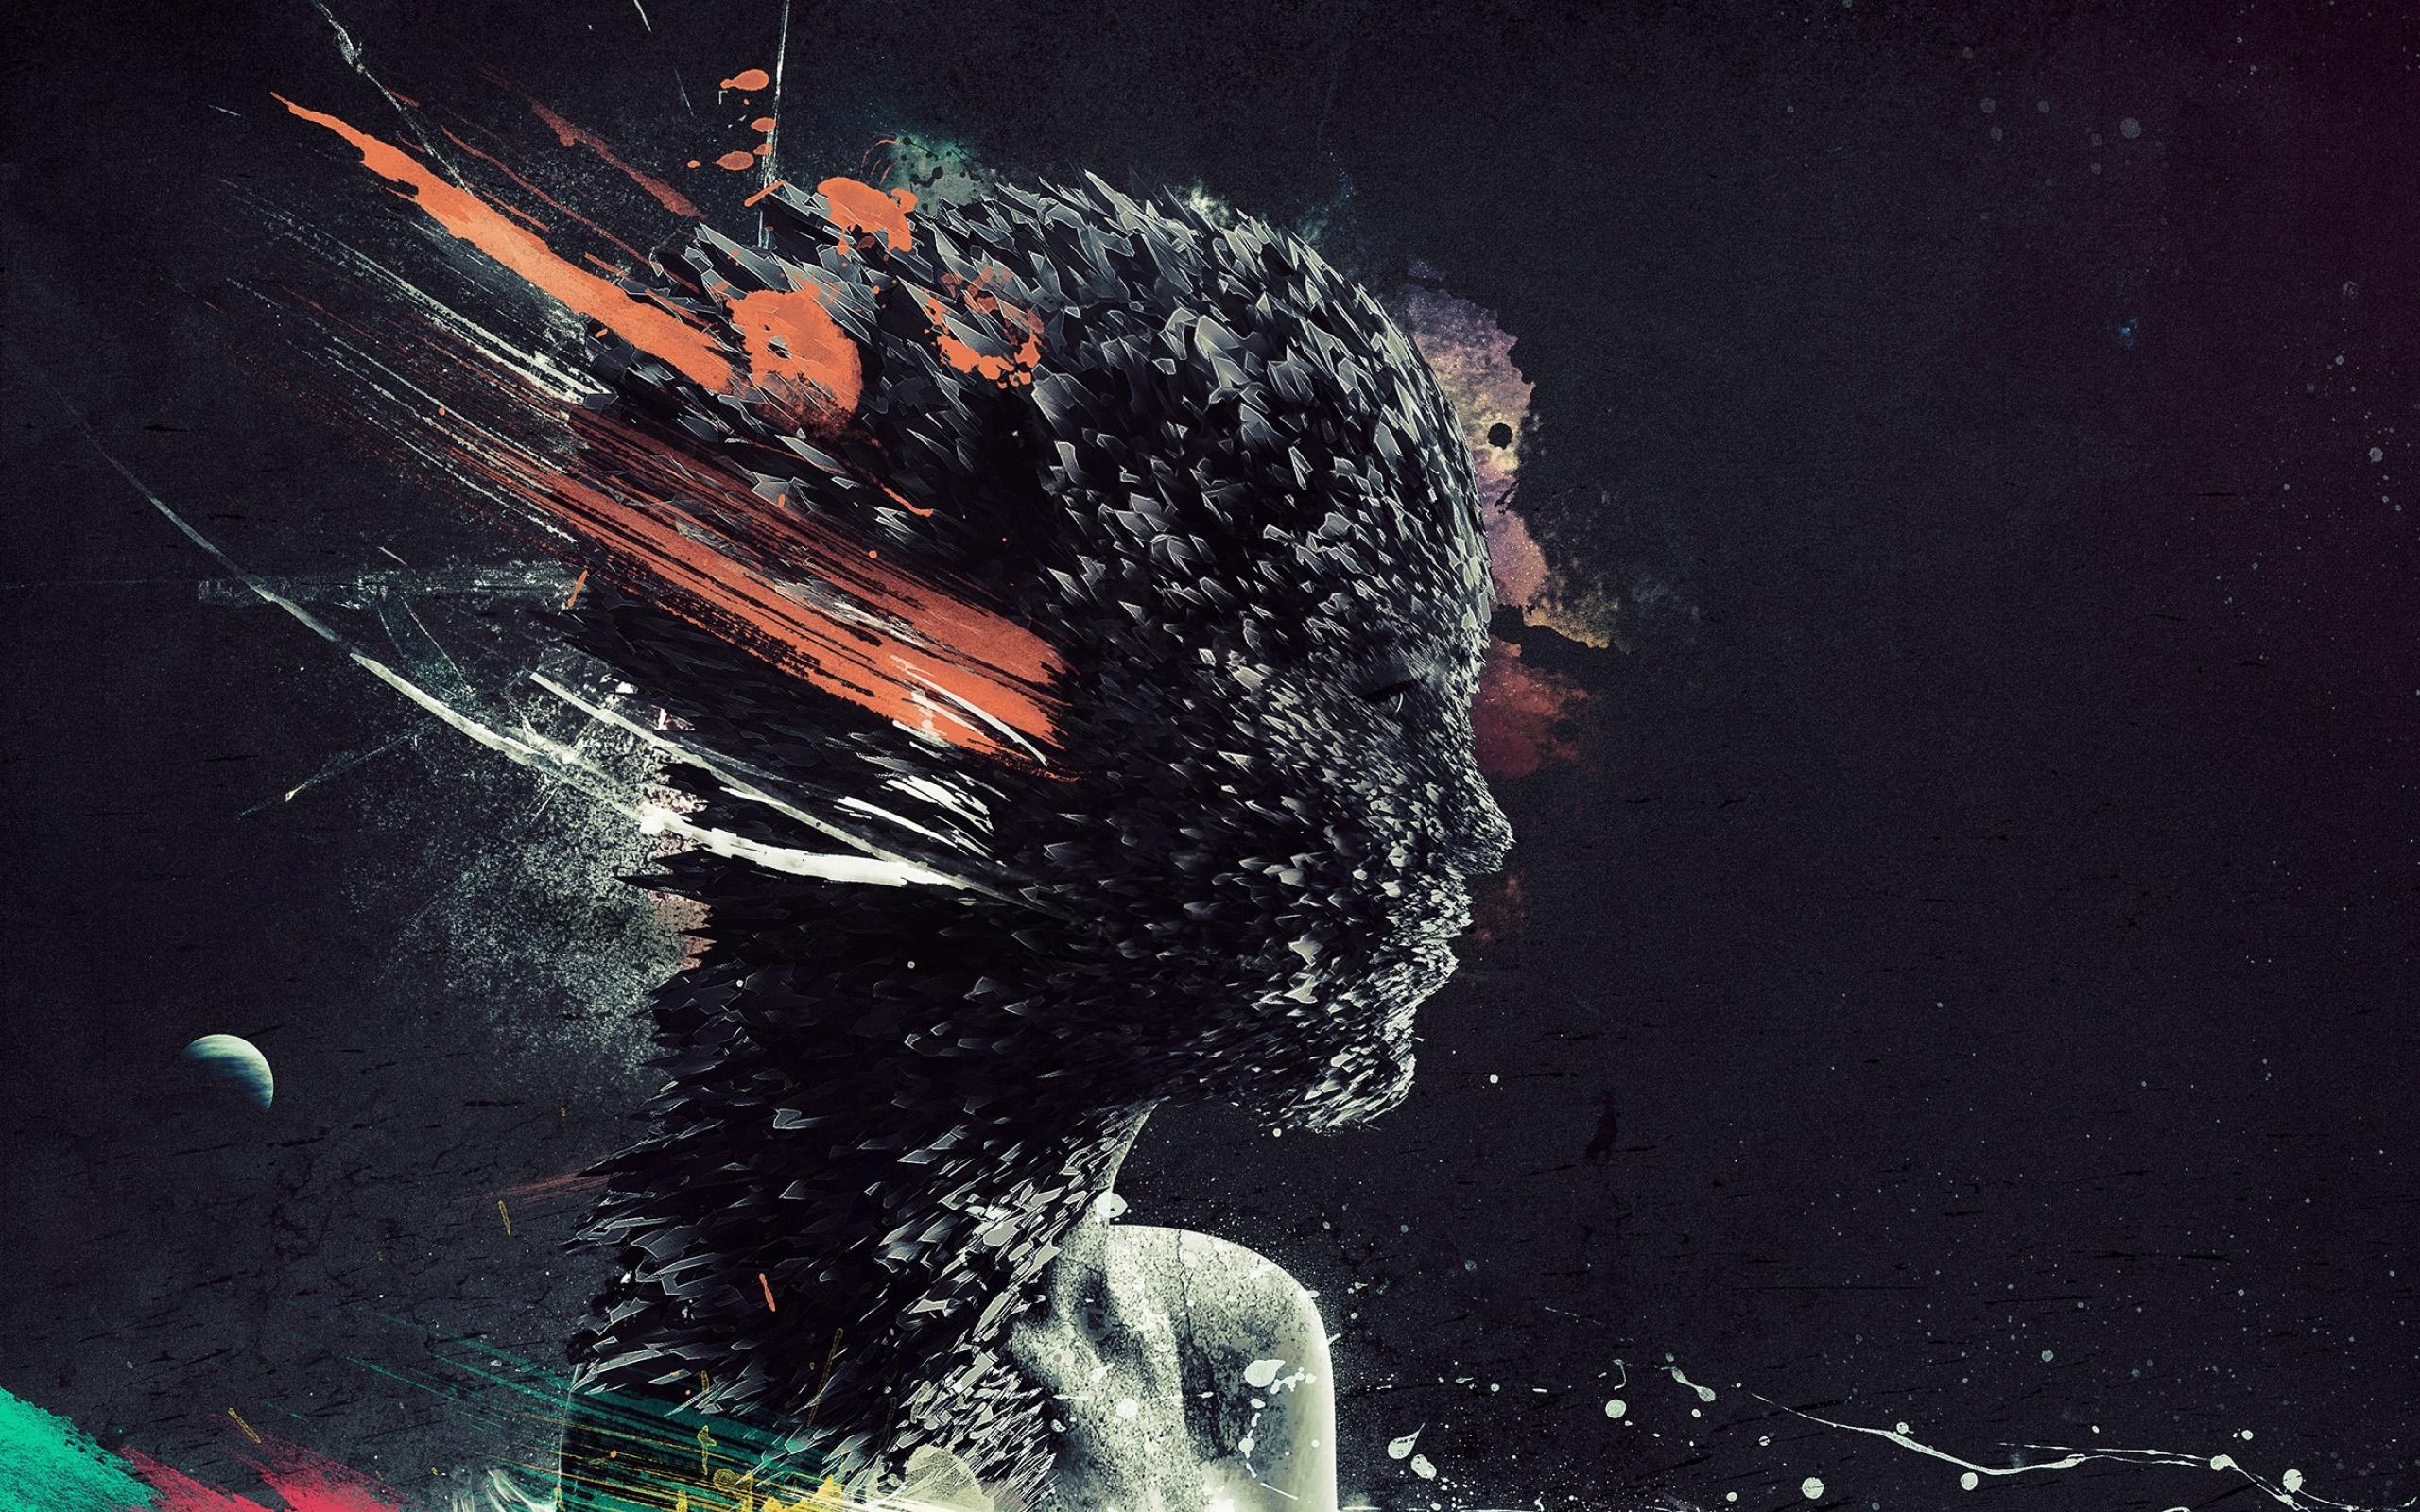 Abstract Digital Art - HD Wallpaper